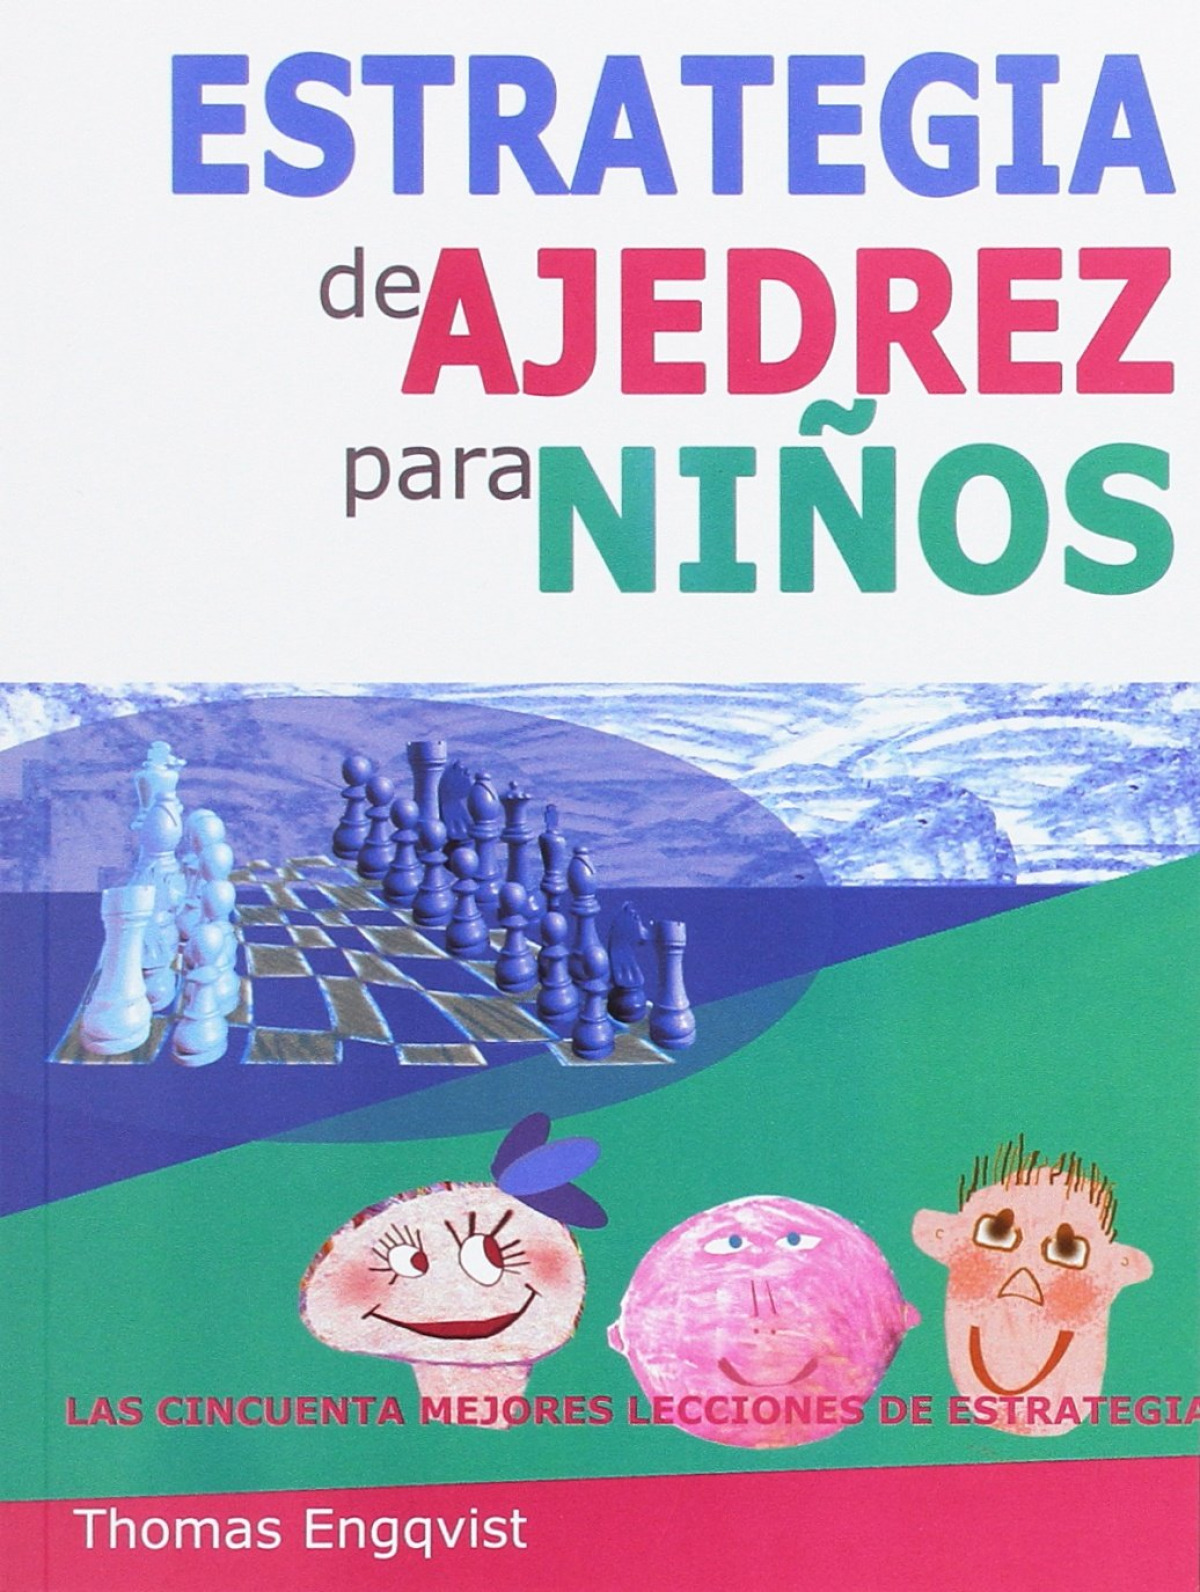 ESTRATEGIAS DE AJEDREZ PARA NIñOS 9788492517879